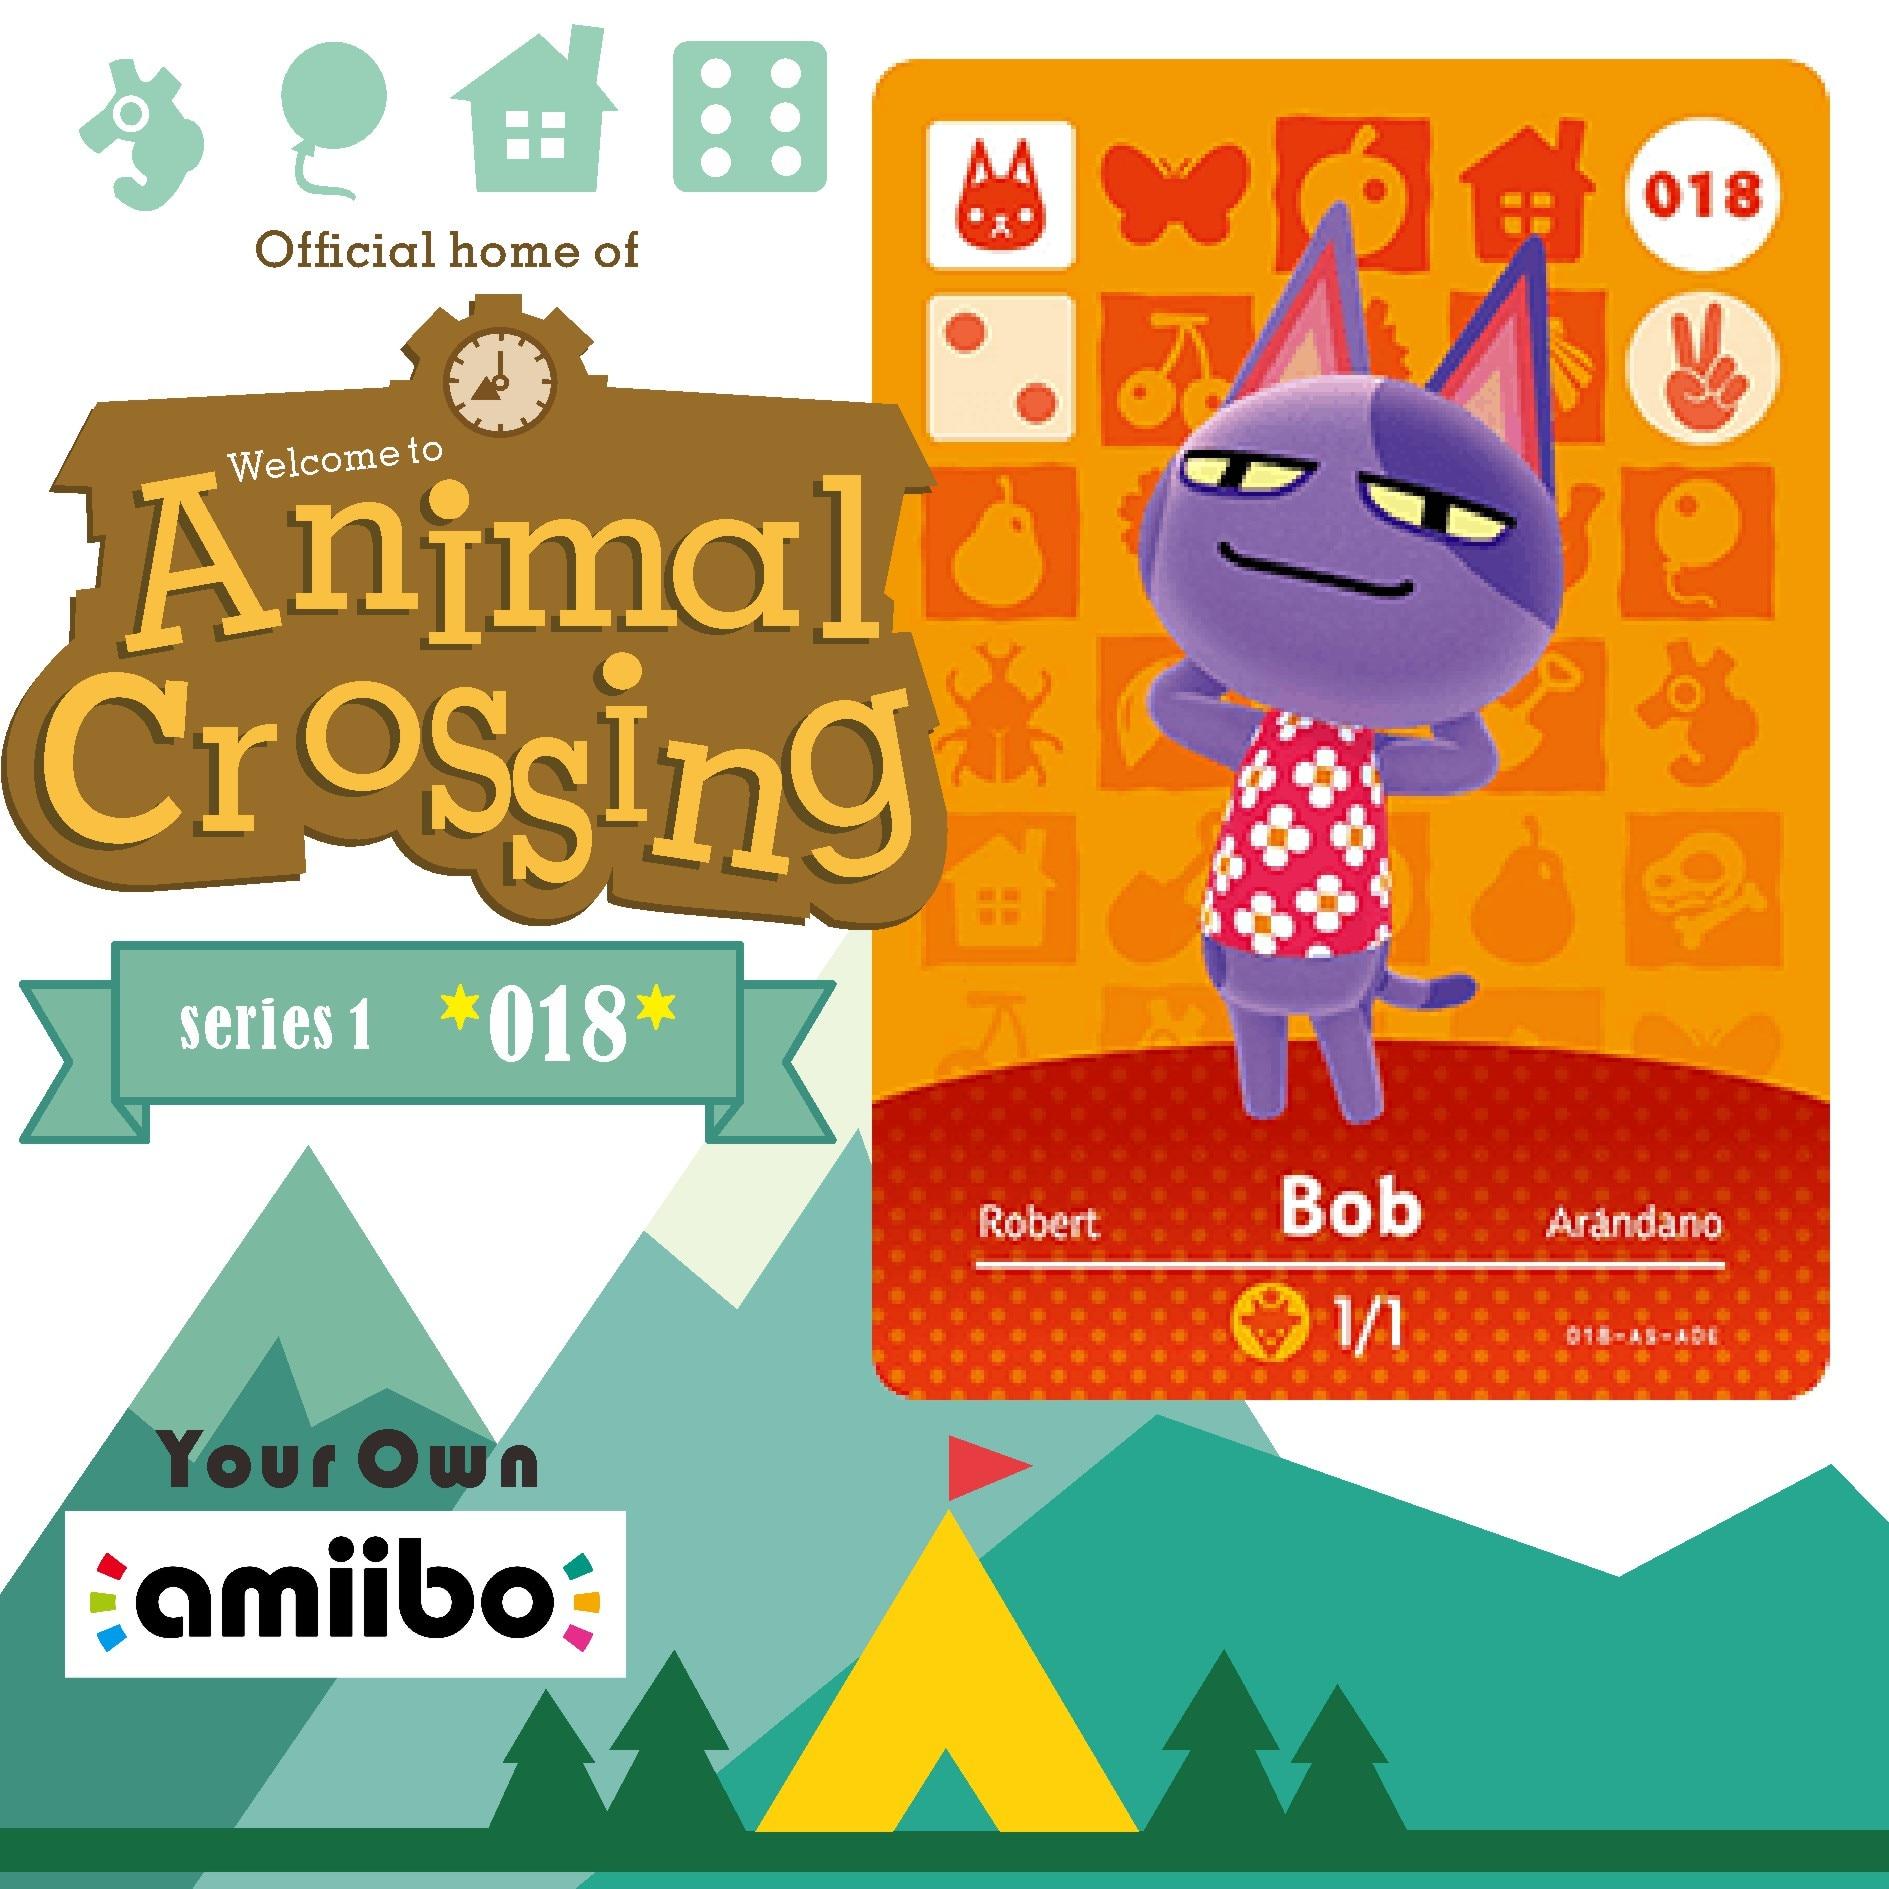 018 Bob Animal Crossing Bob Amiibo Animal Crossing Switch Rv Welcome Amiibo Villager New Horizons Amiibo Card Gift Cross Card